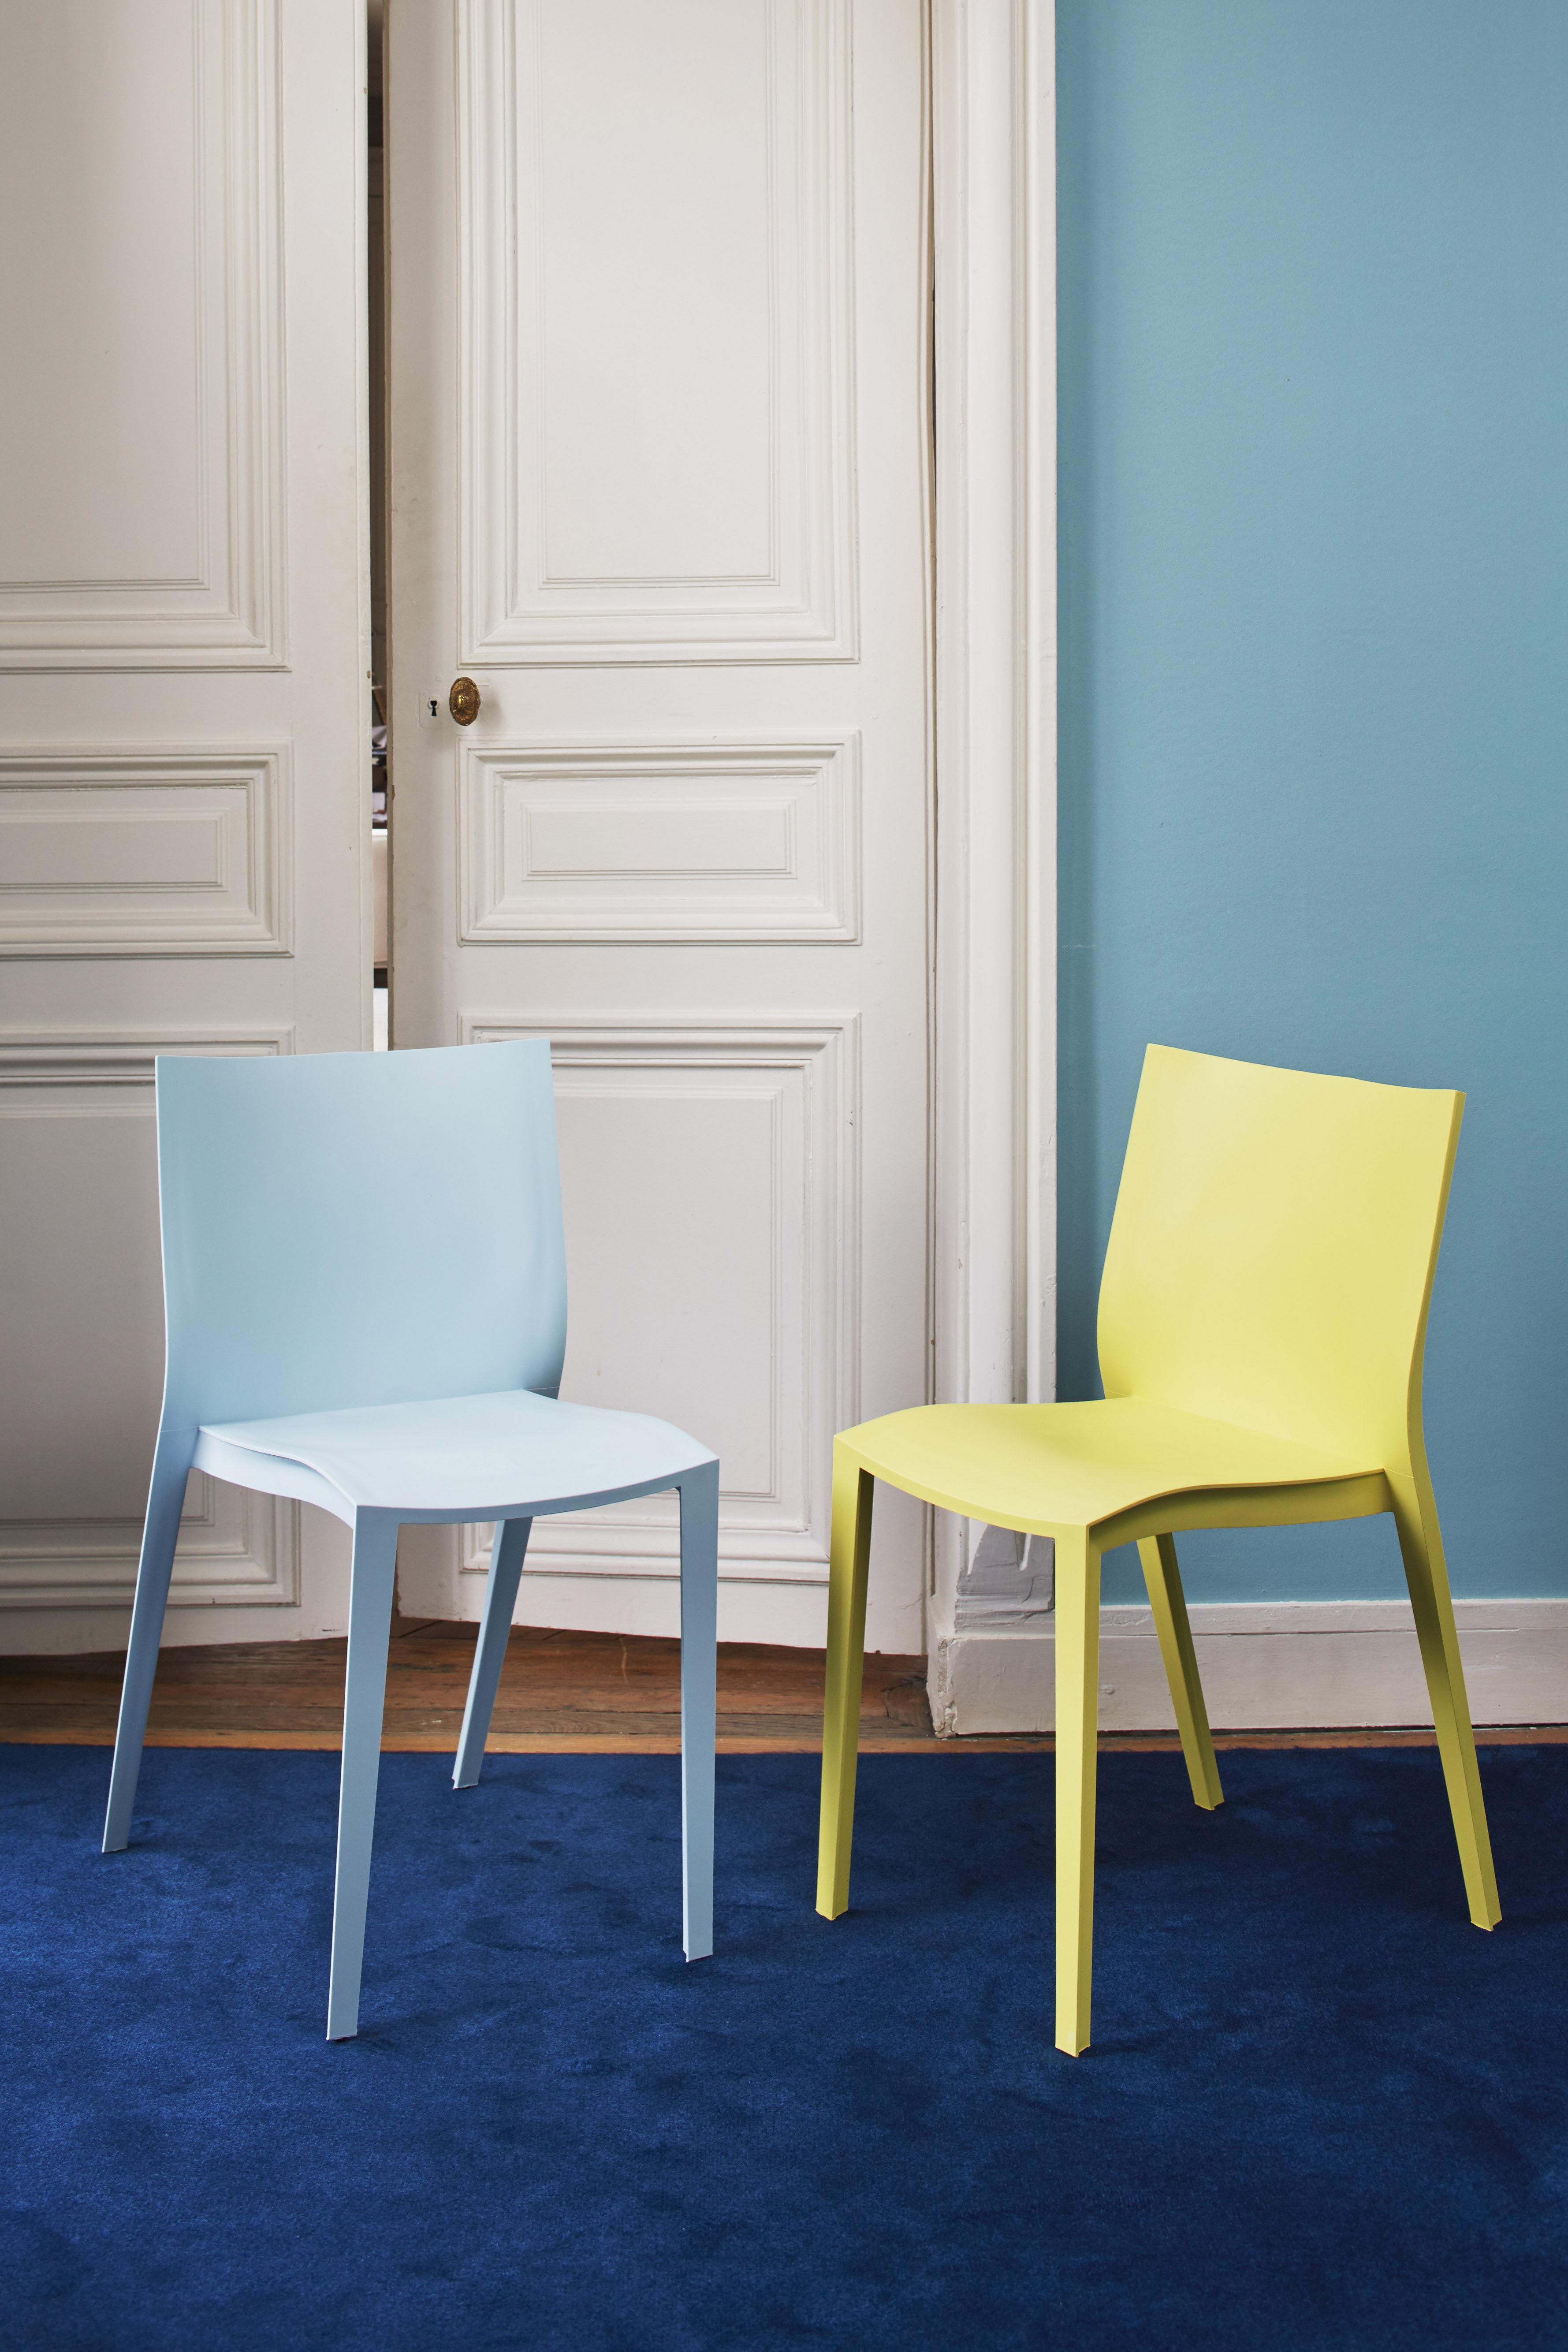 slick slick stapelbarer stuhl von philippe starck anisgr n by xo made in design. Black Bedroom Furniture Sets. Home Design Ideas